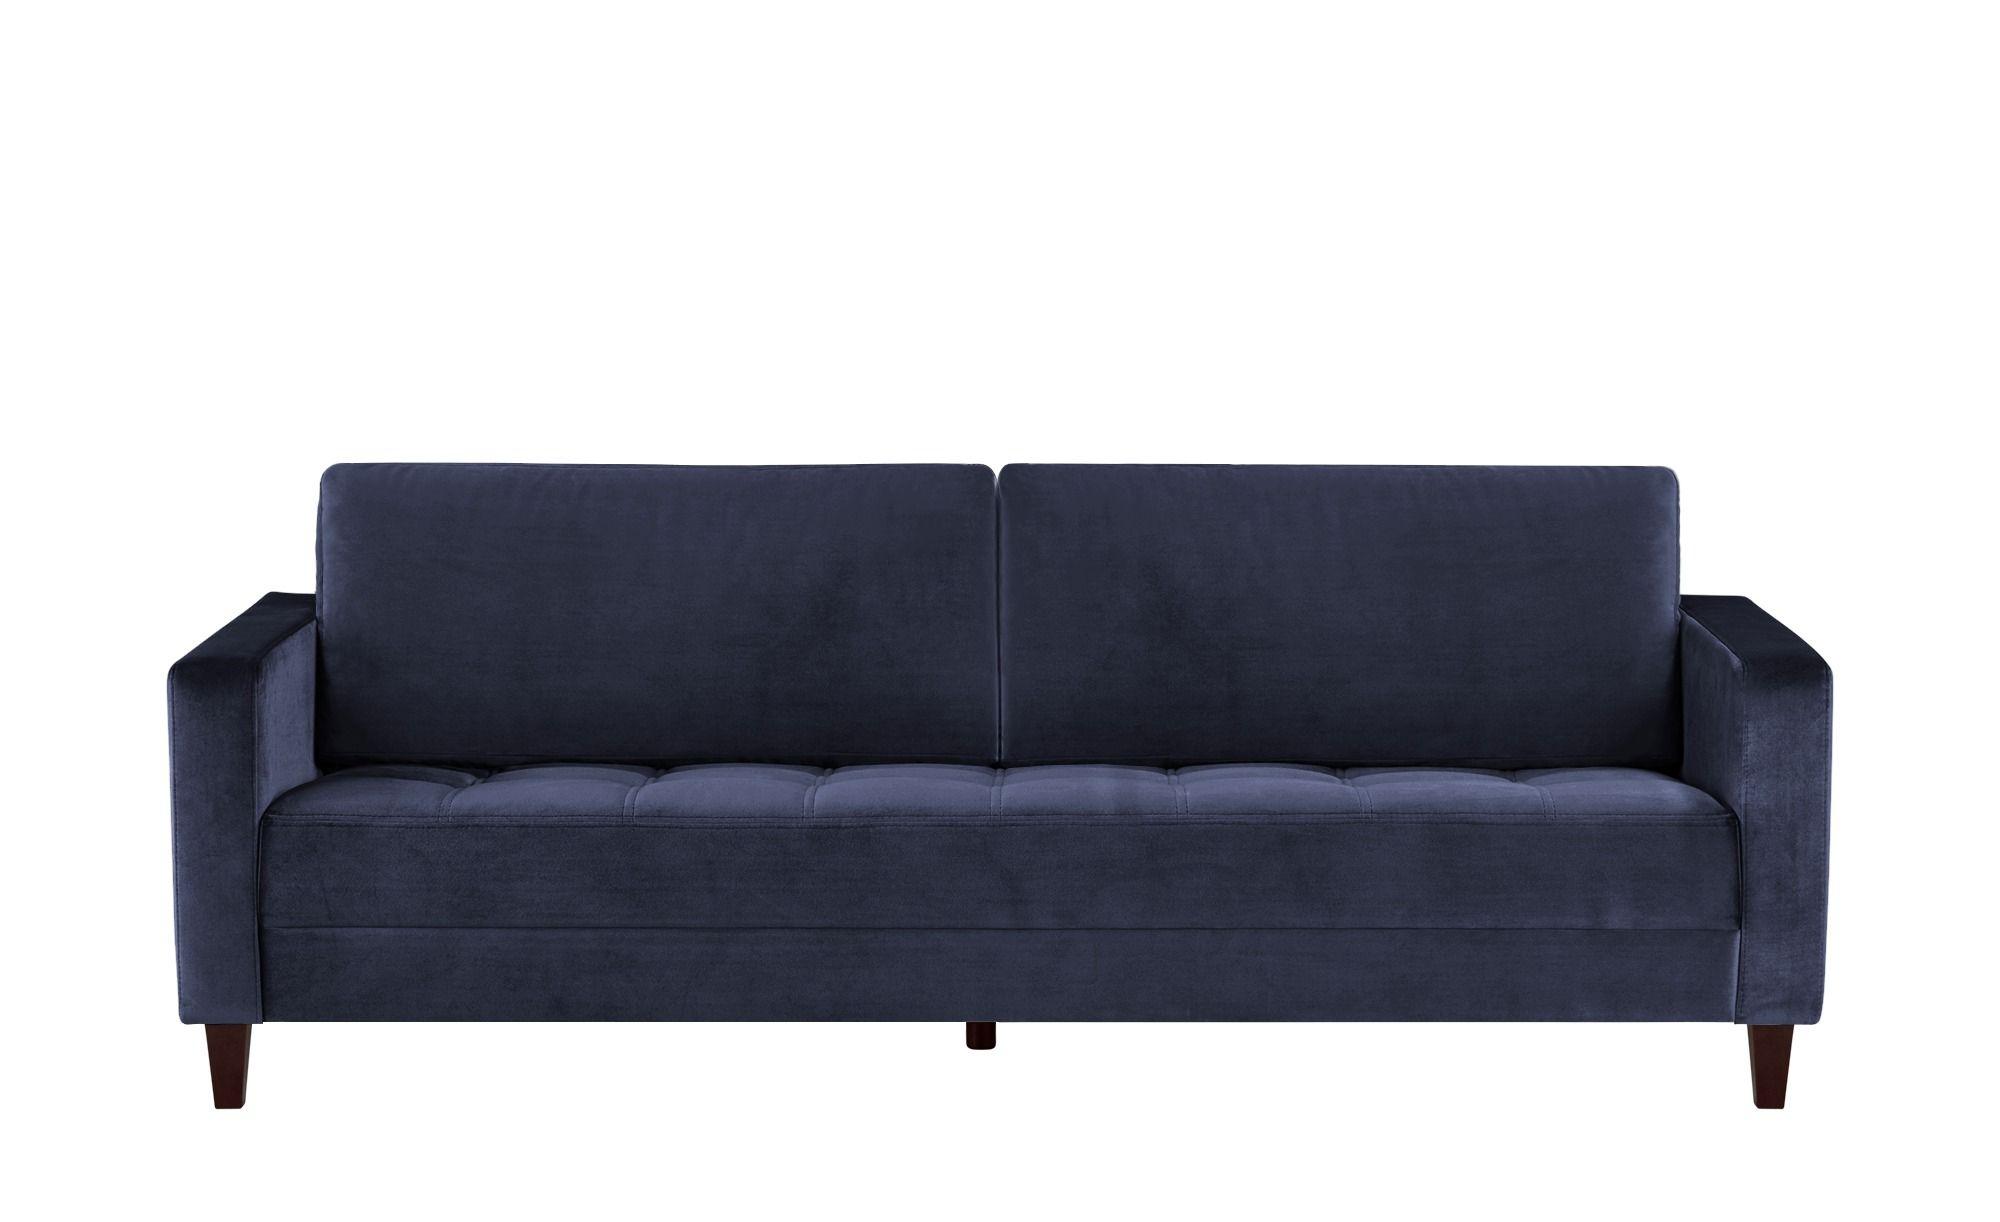 Smart Sofa Blau Mikrofaser Geradine Sofa Sofa Gelb Und Haus Deko